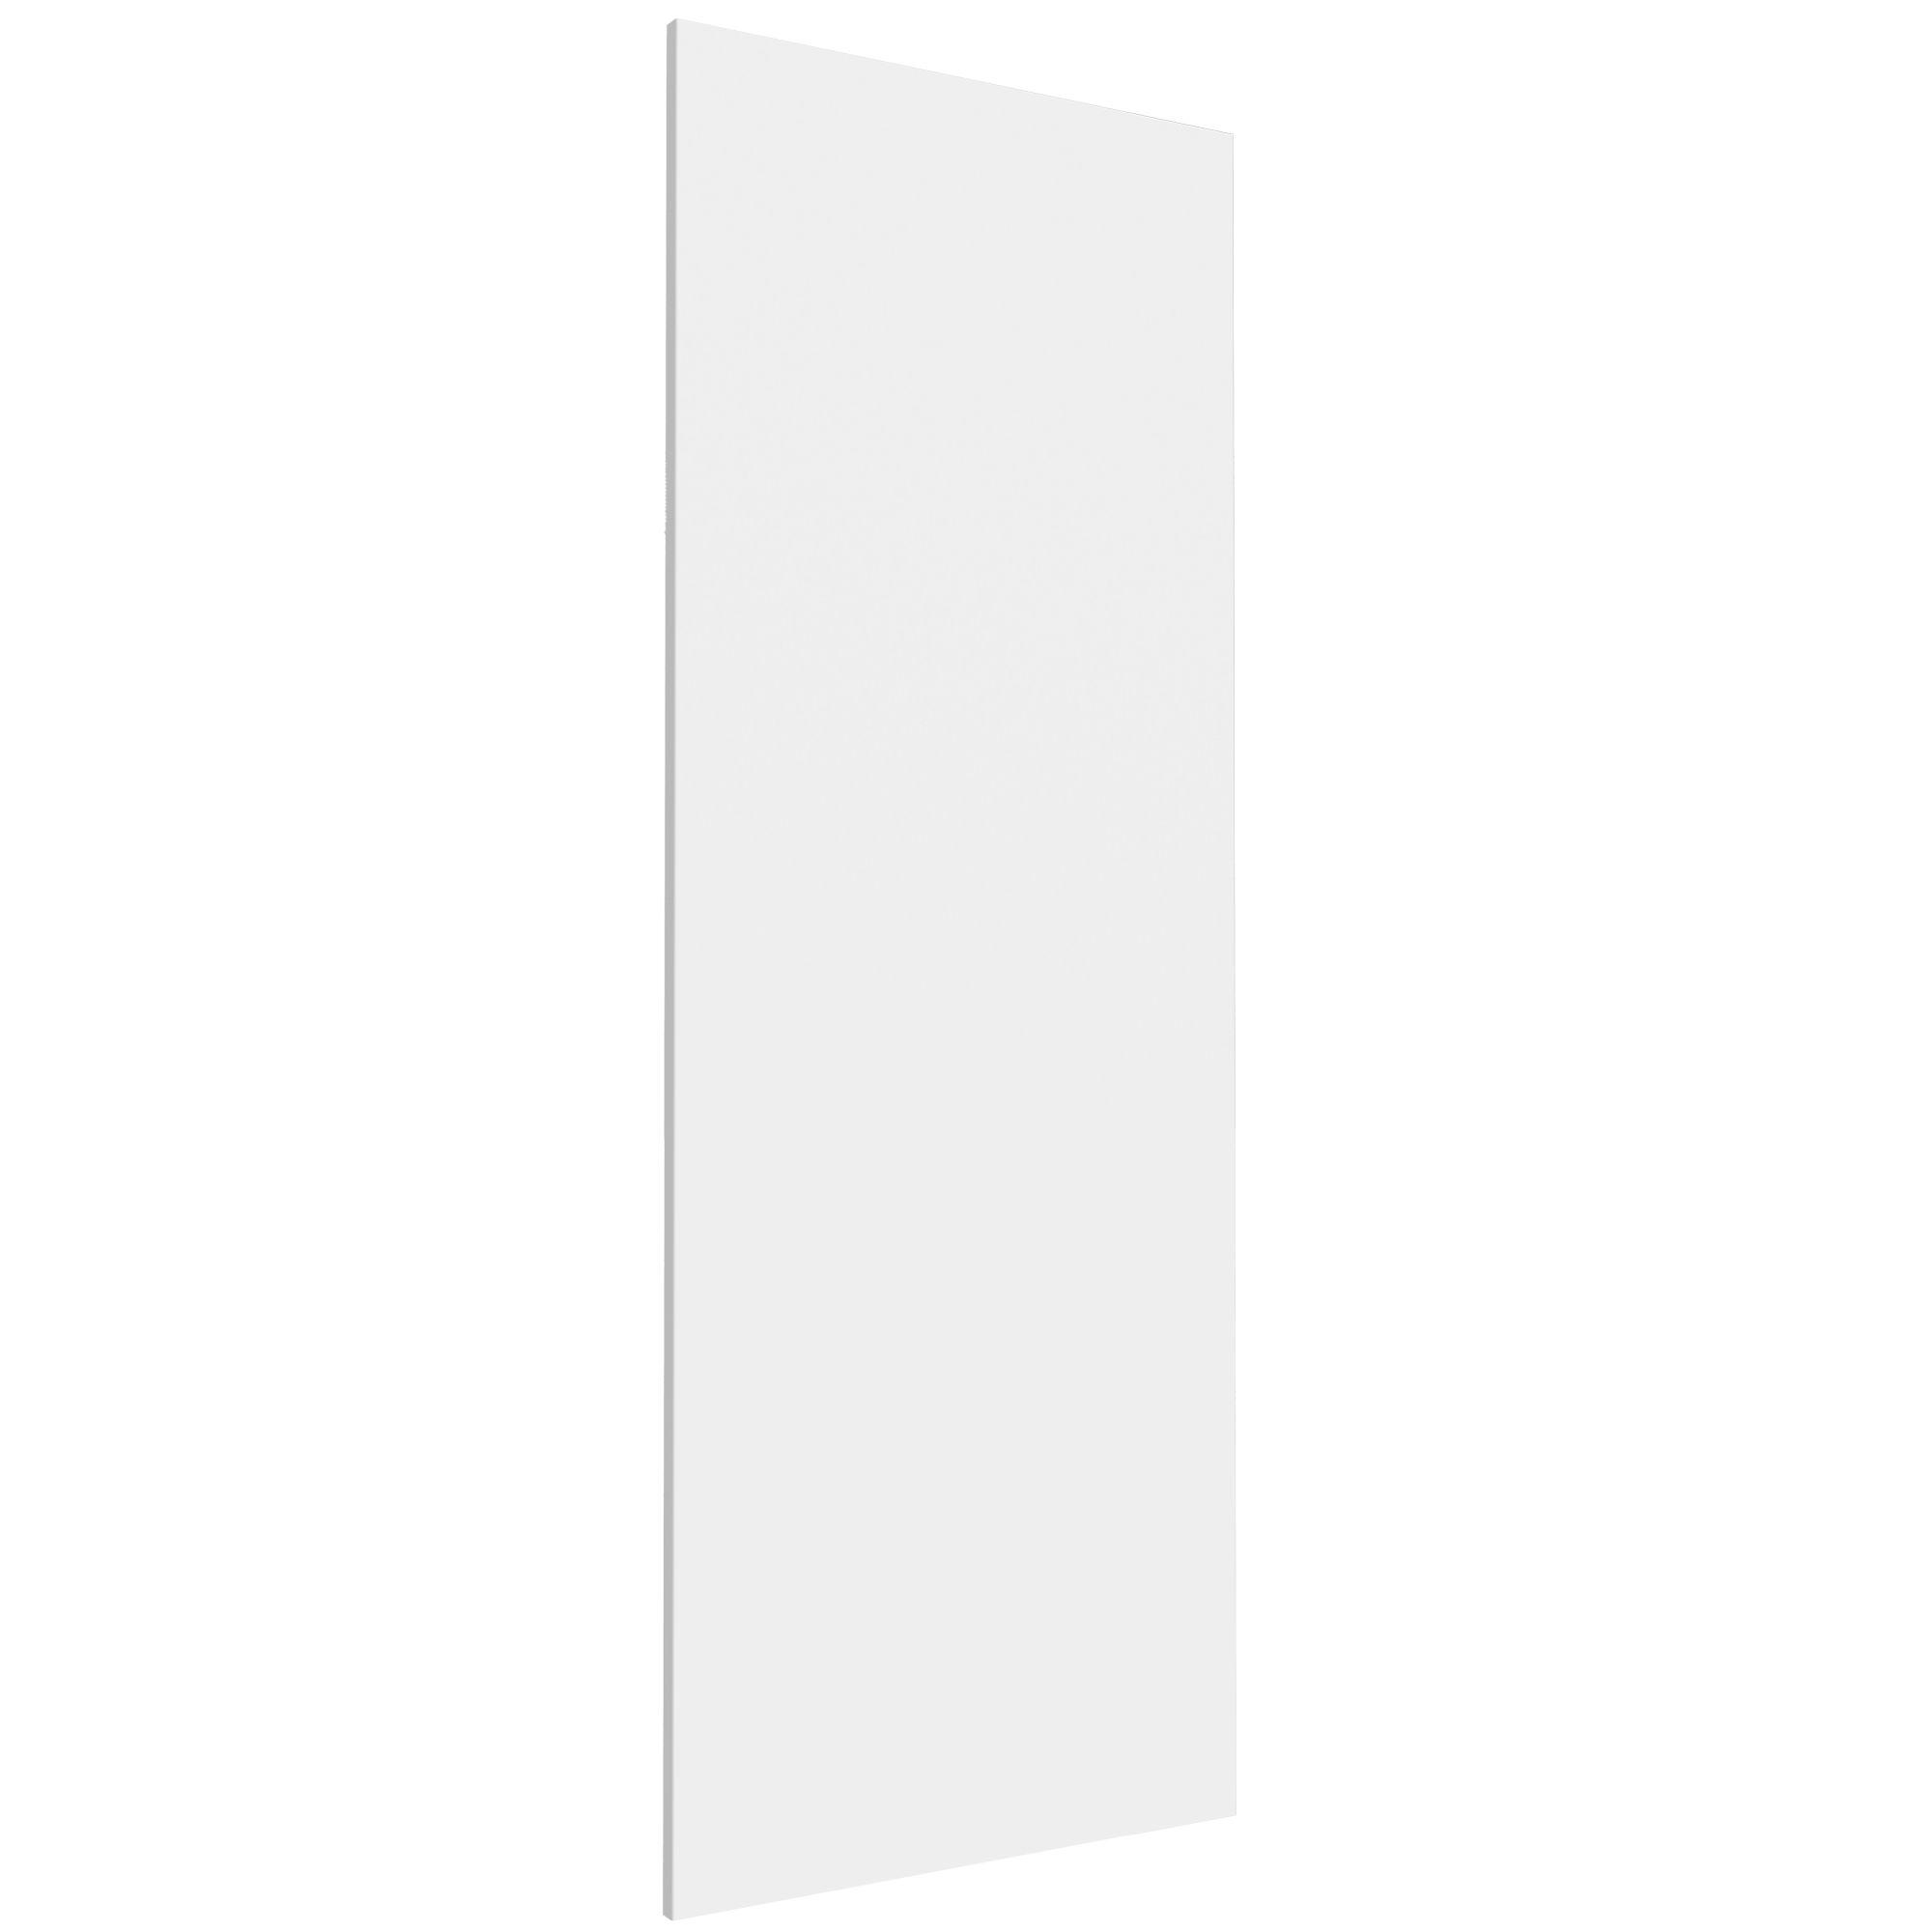 Darwin Modular White Wardrobe Door (h)1440mm (w)497mm